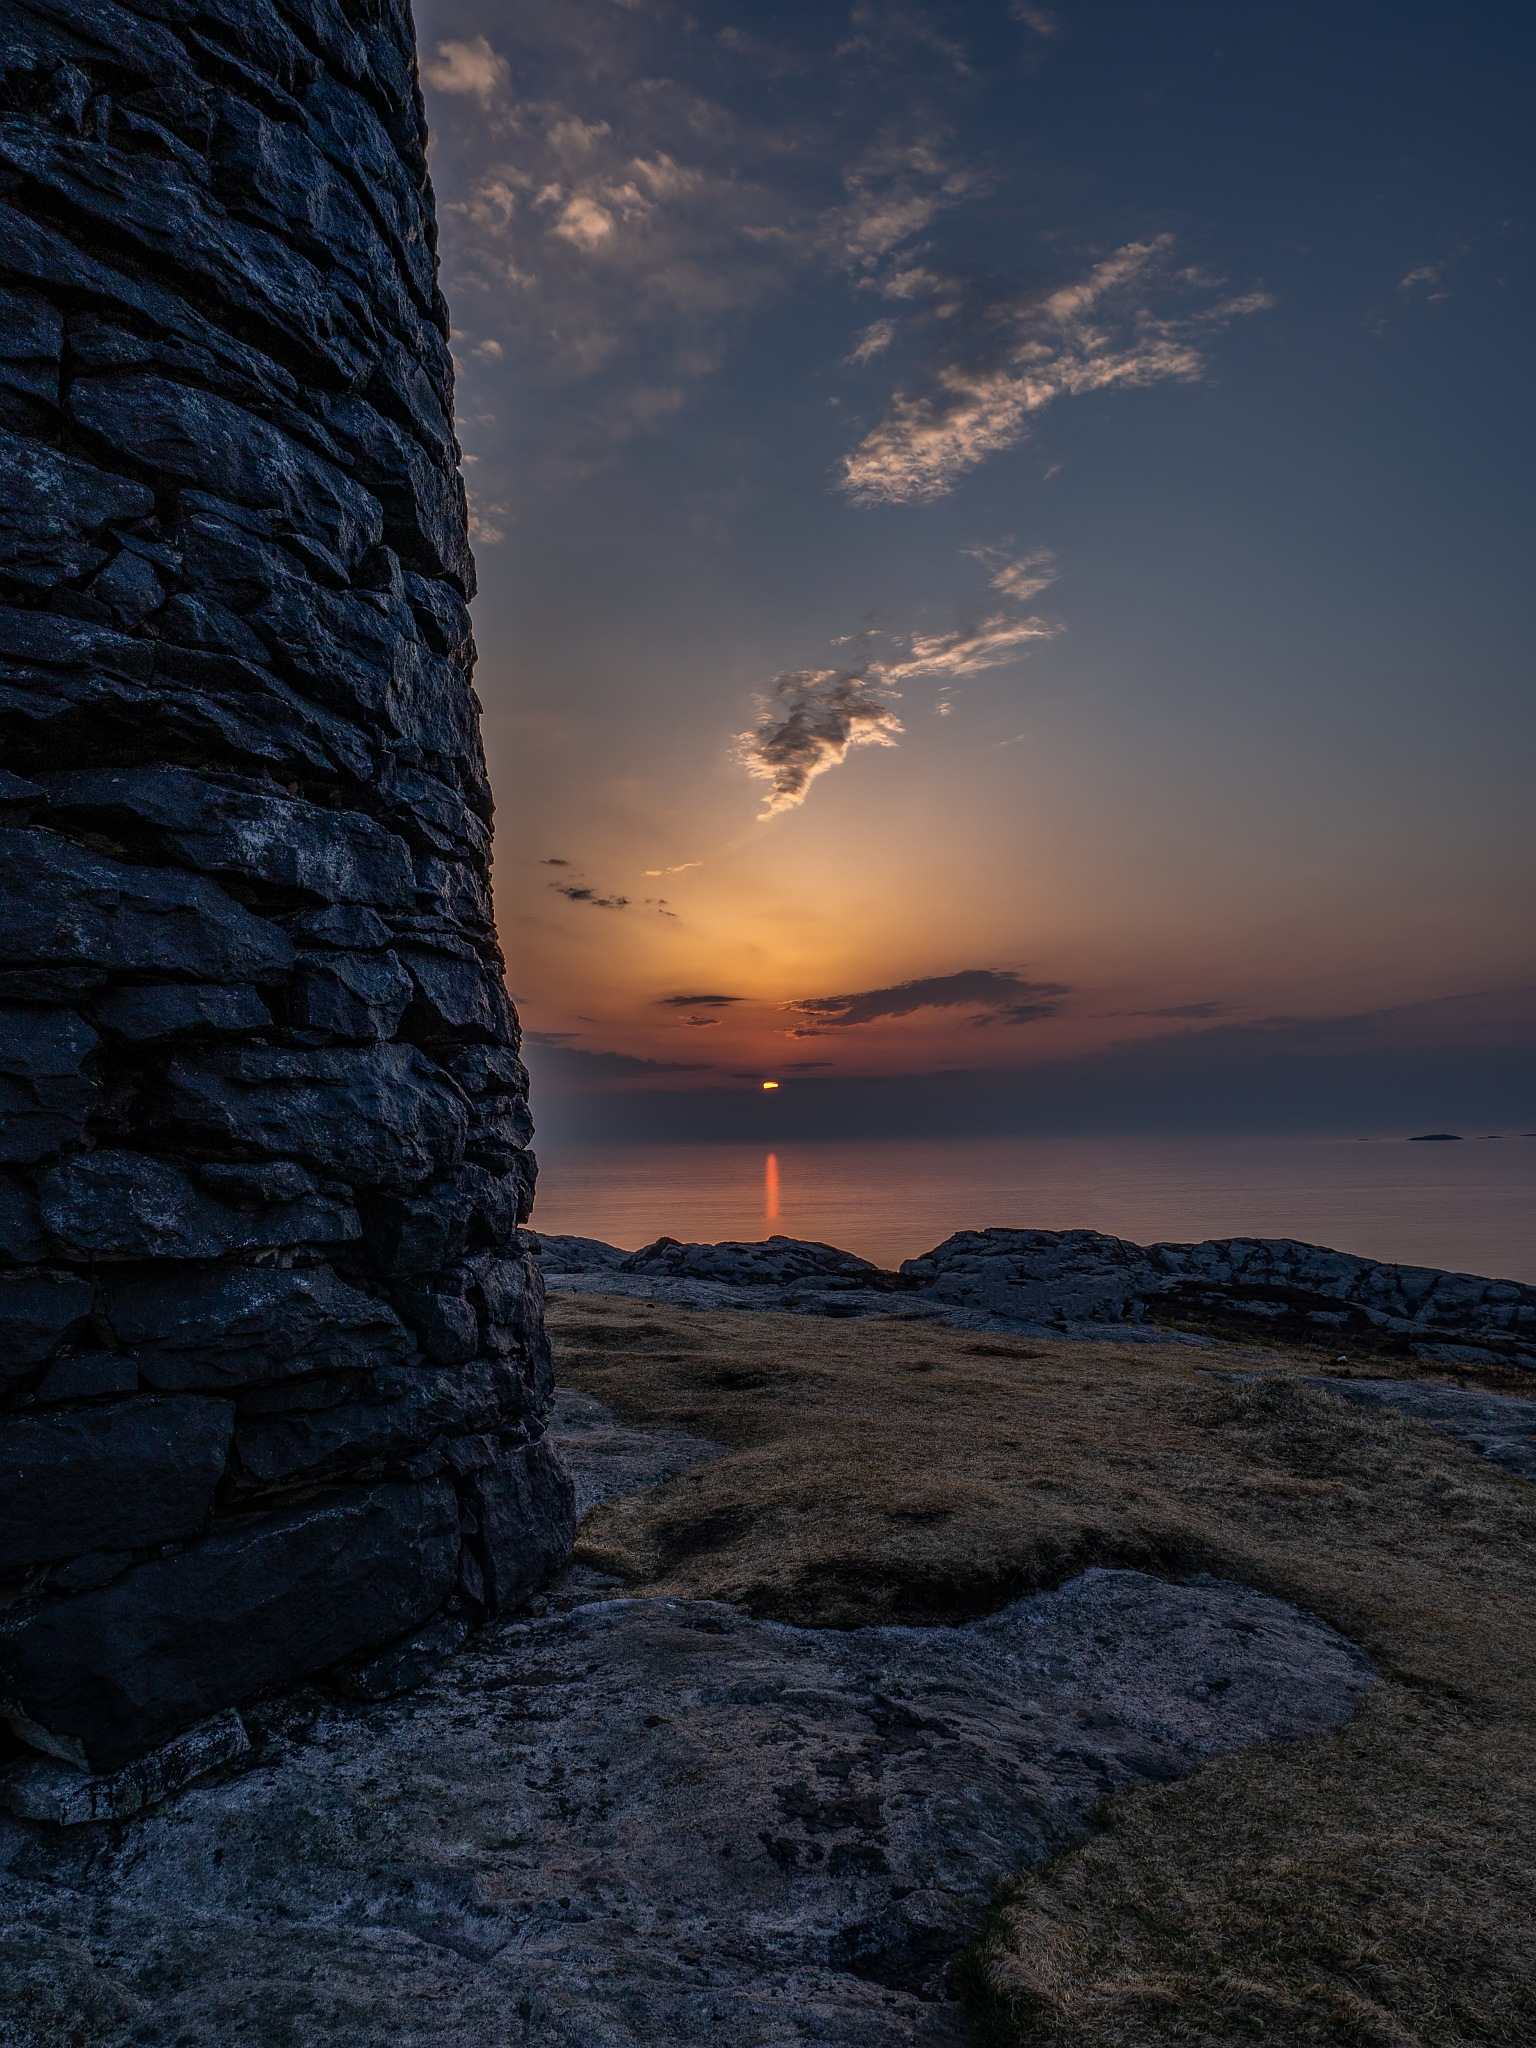 Sun clouds by Steven Harrison Snoots